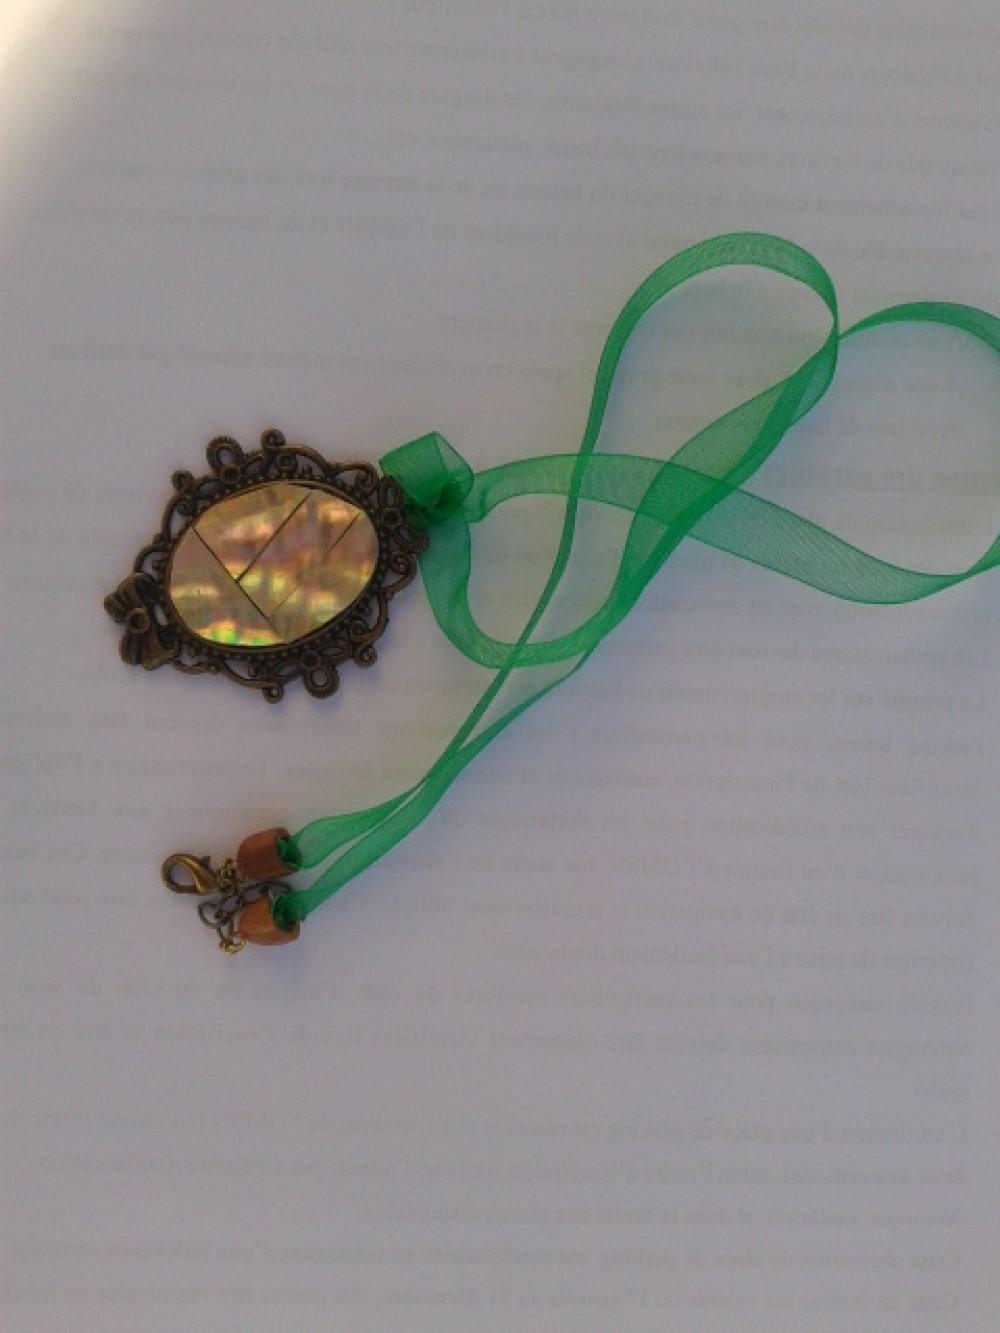 Collier ruban avec pendentif support bronze NACRE NORMANDE